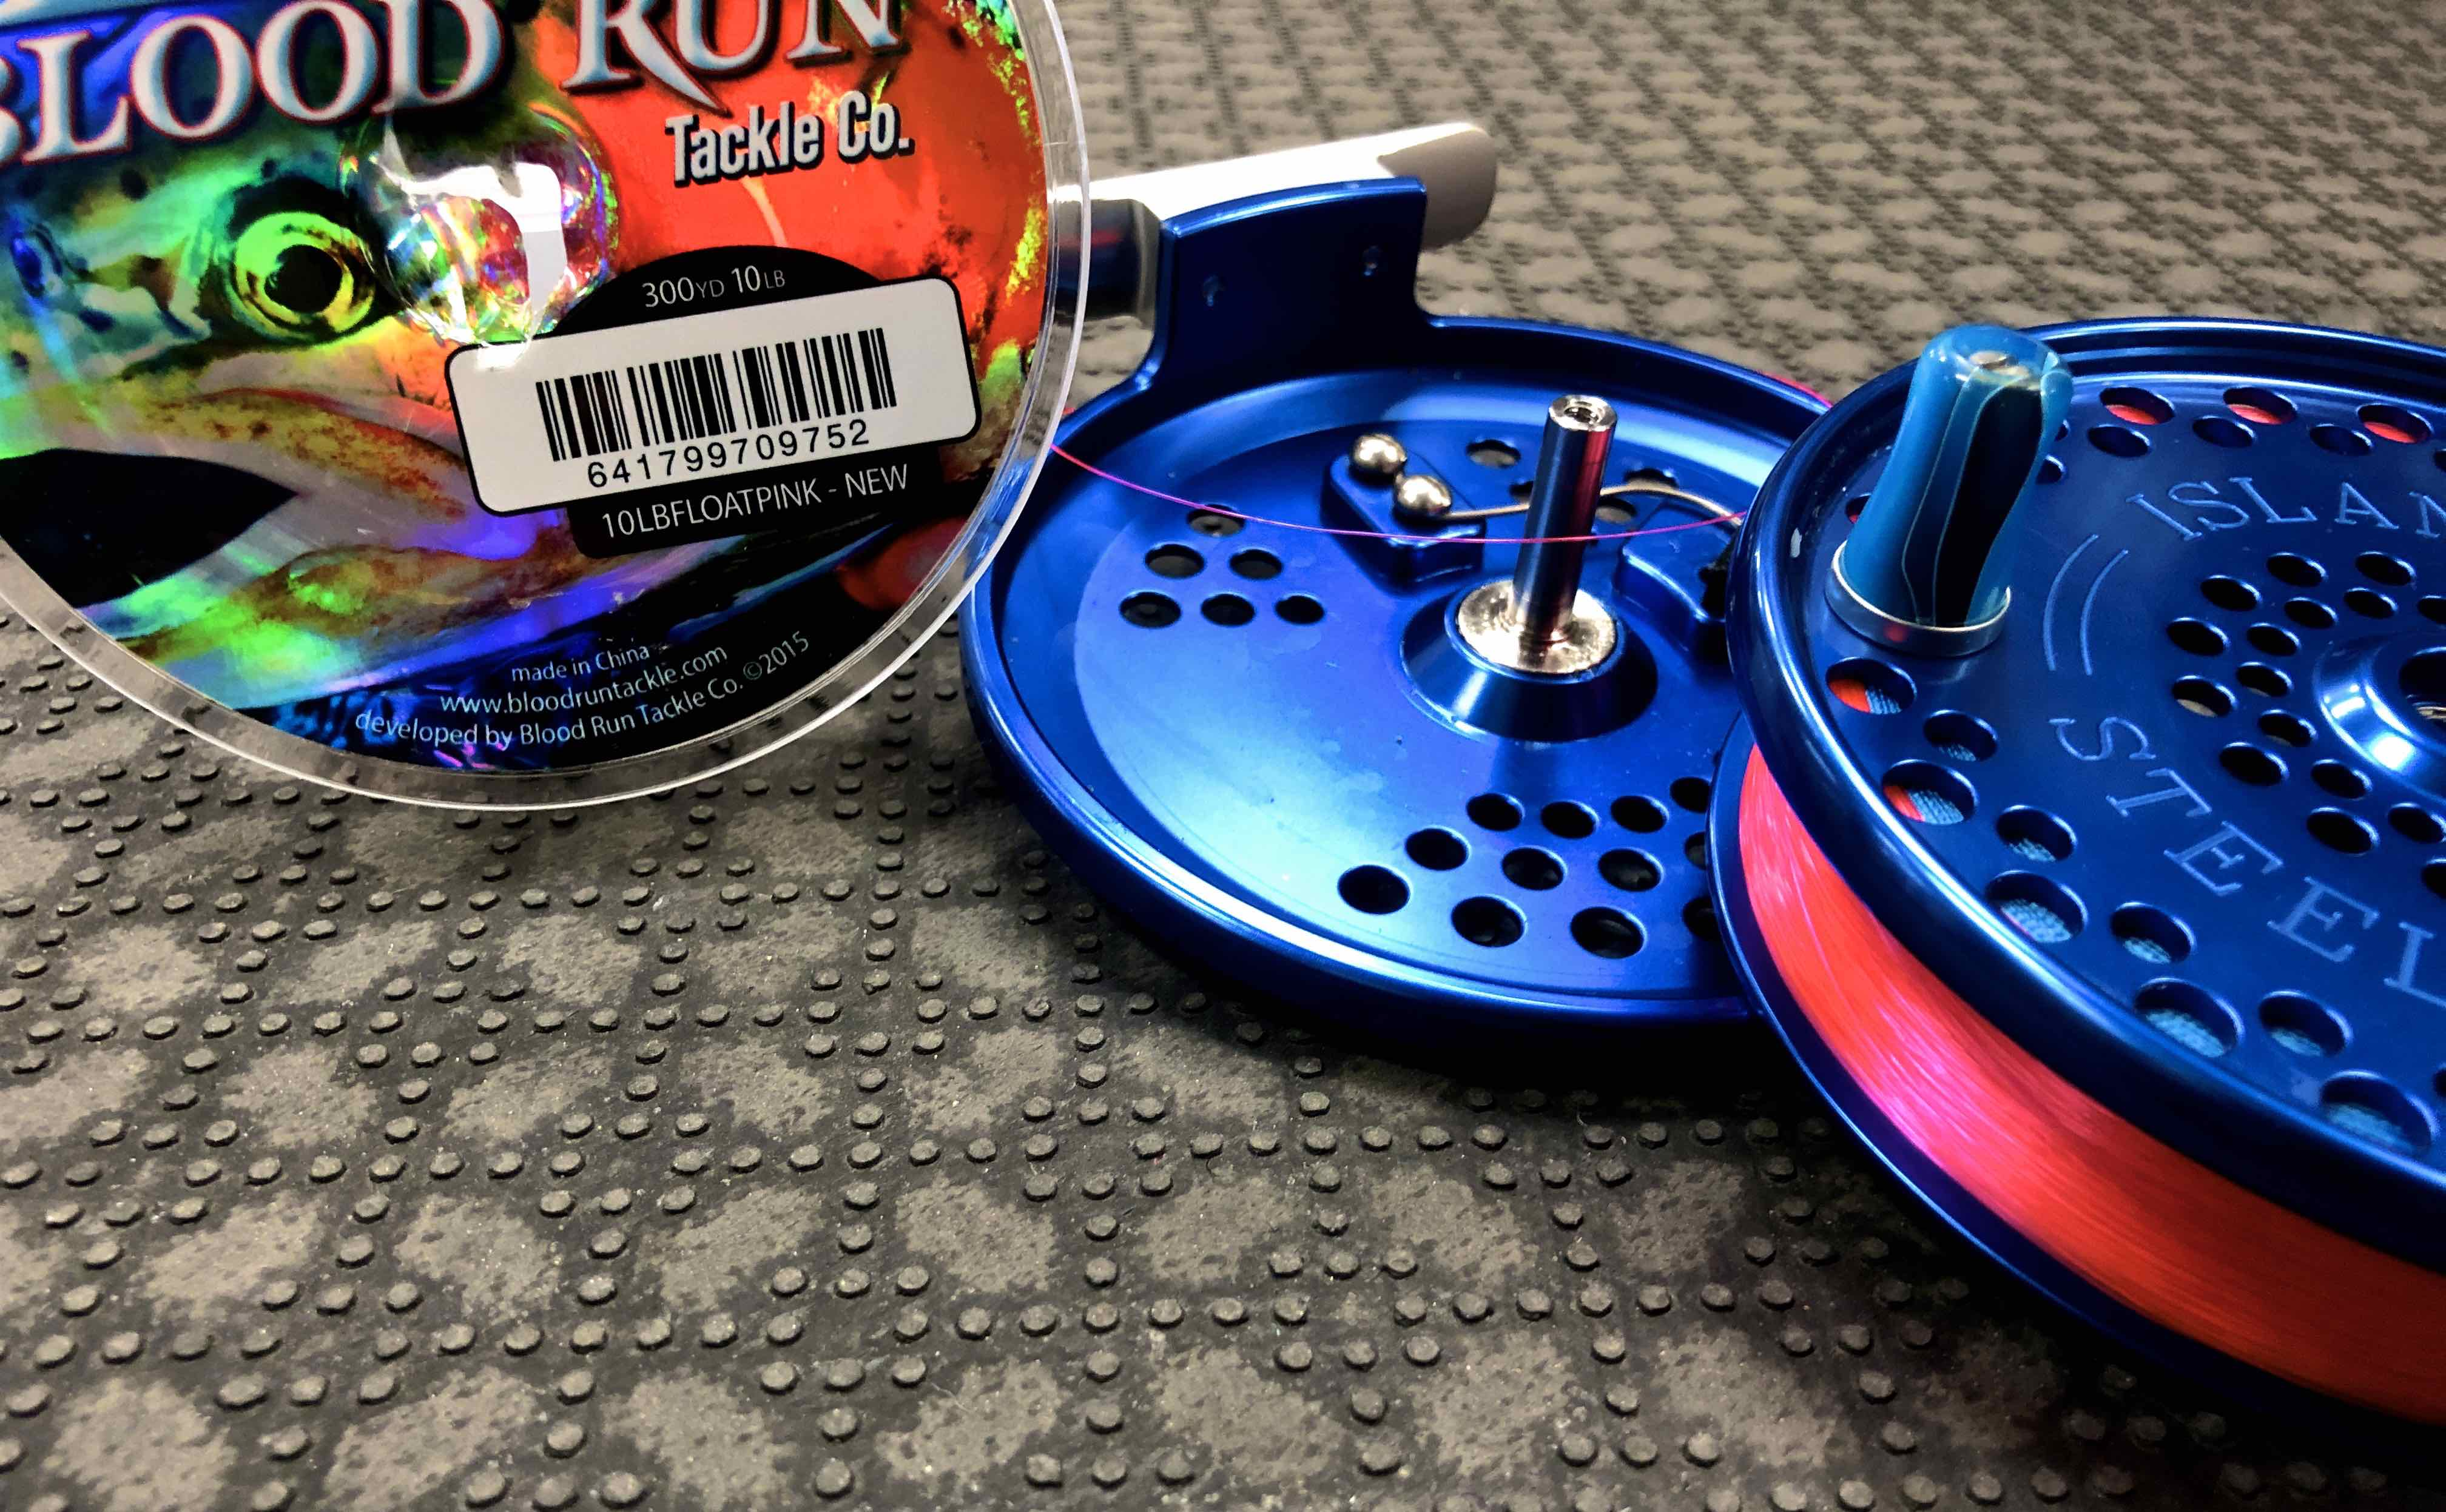 ISlander IS Steelheader Centerpin Float Reel Custom Blue Acrylic Handles Blood Run Centerpin Float Reel Fishing Line BBB